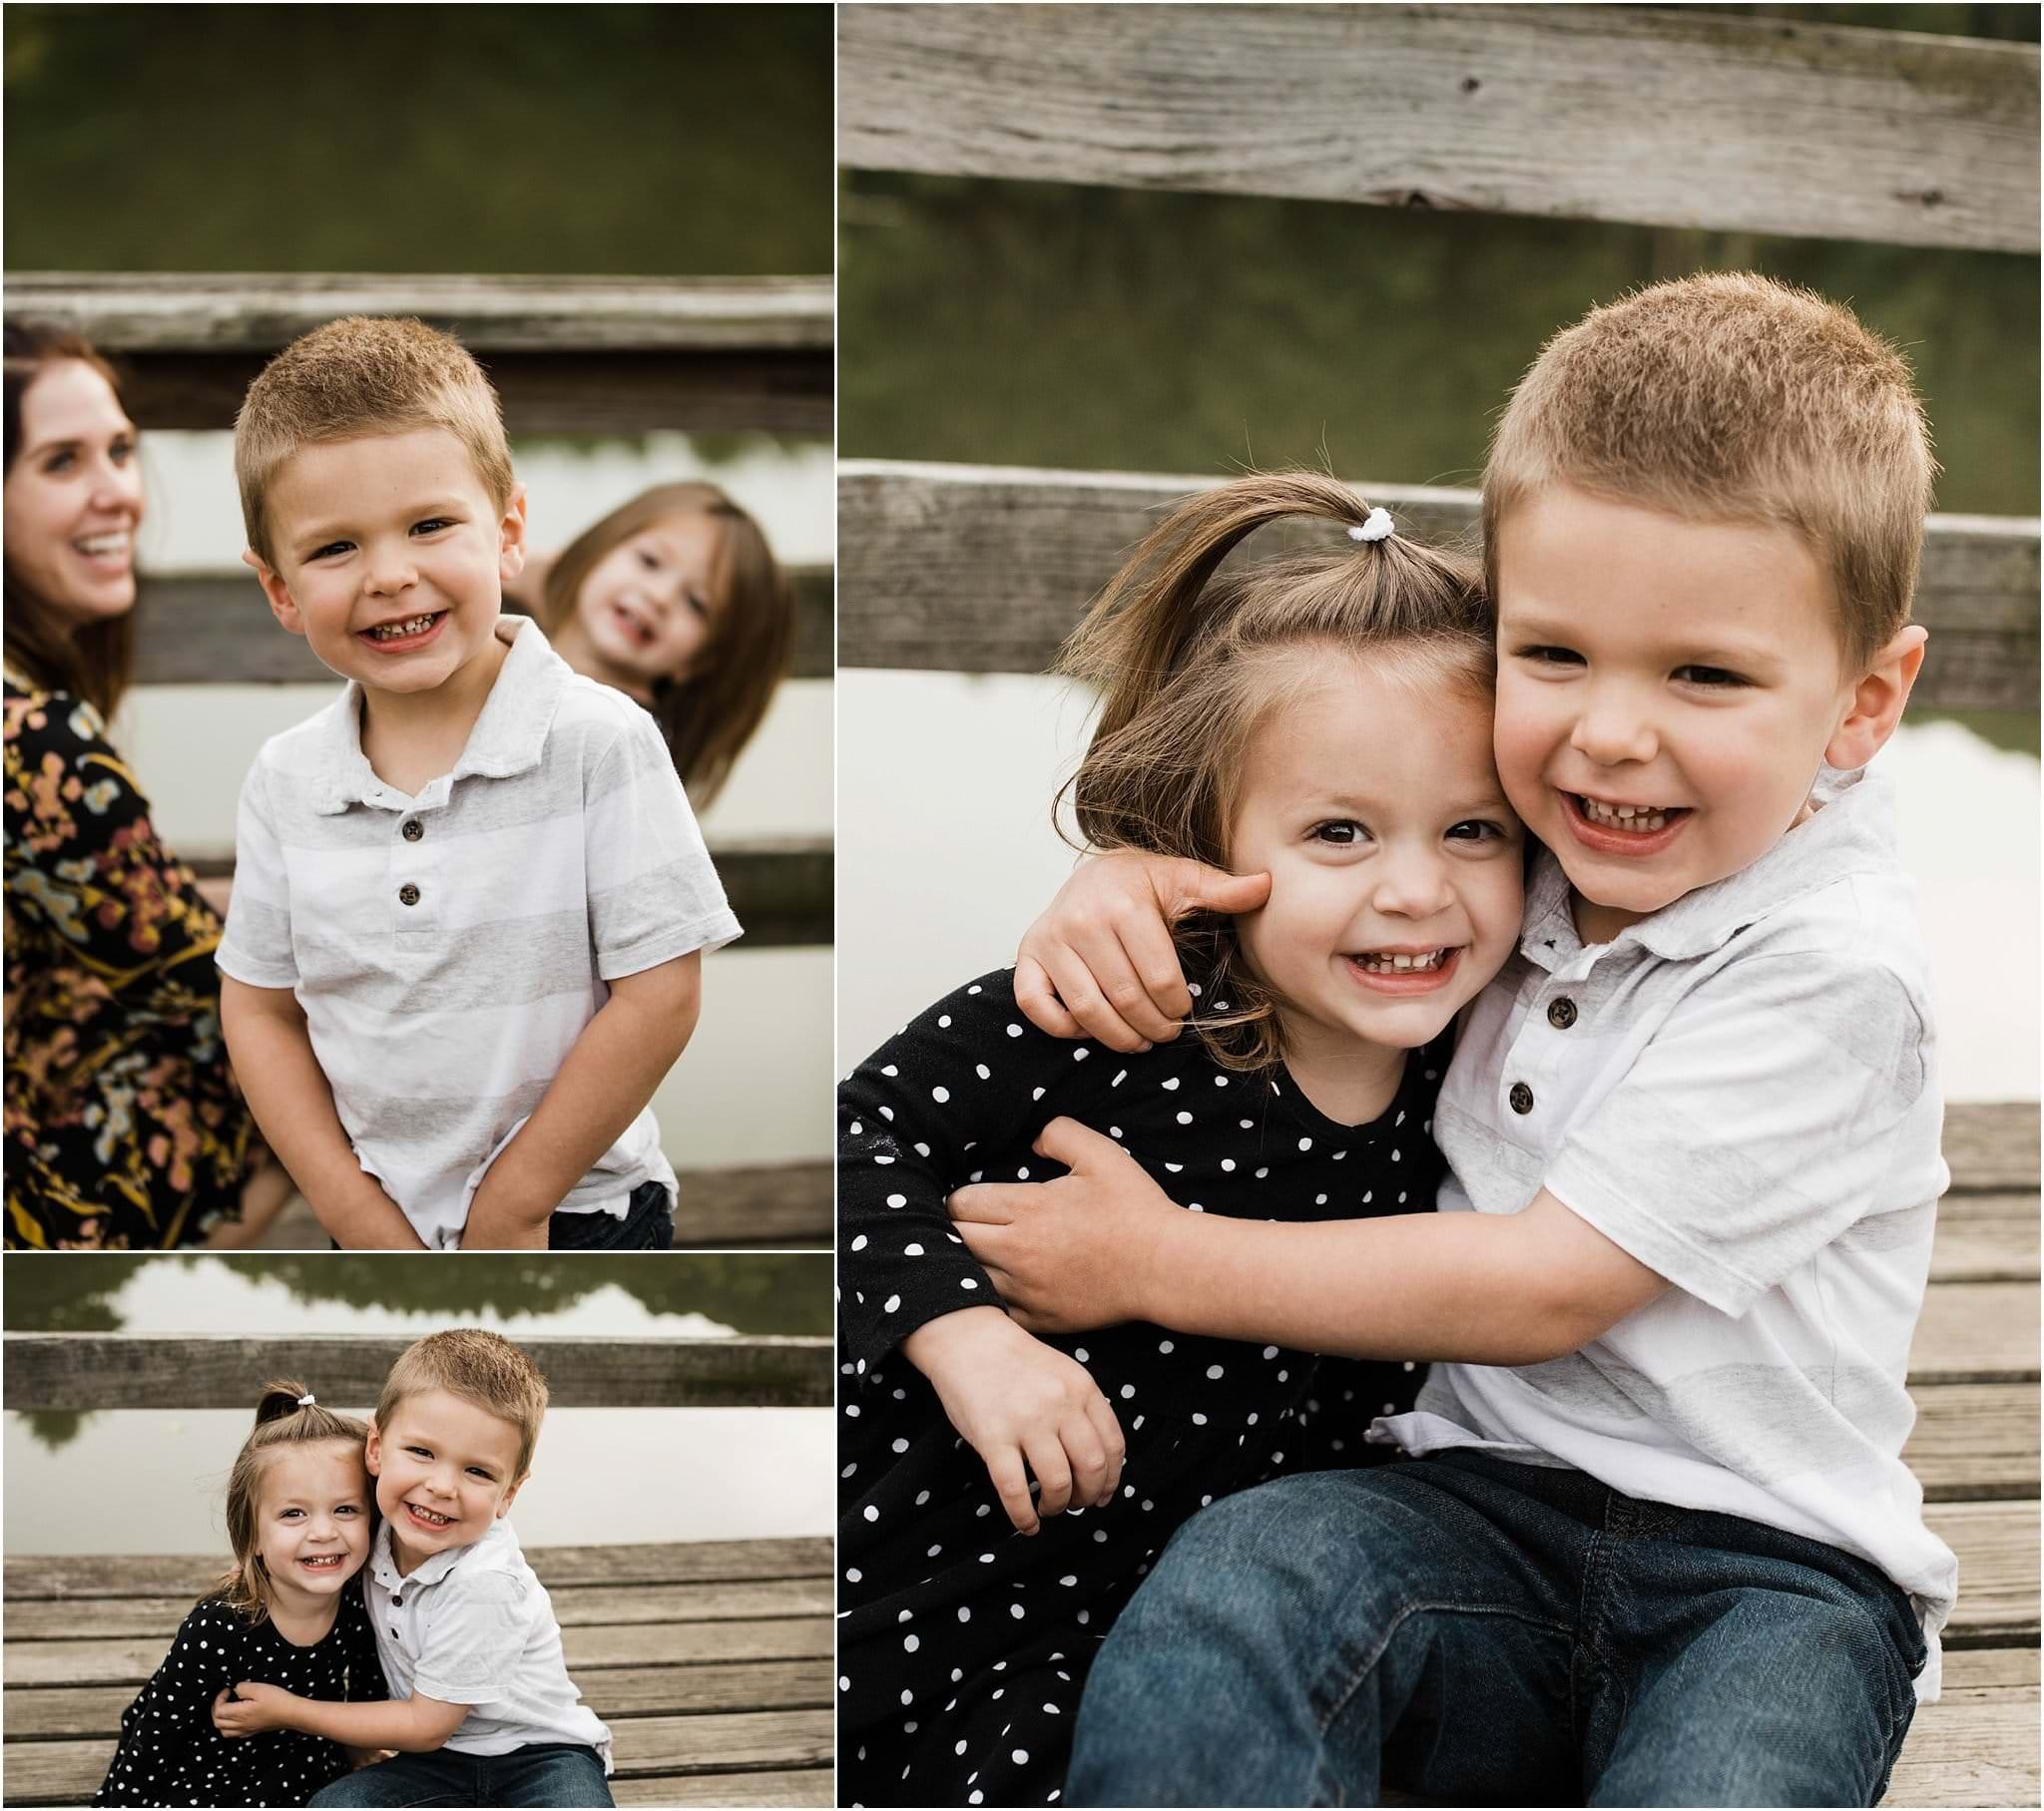 photos of siblings hugging and smiling